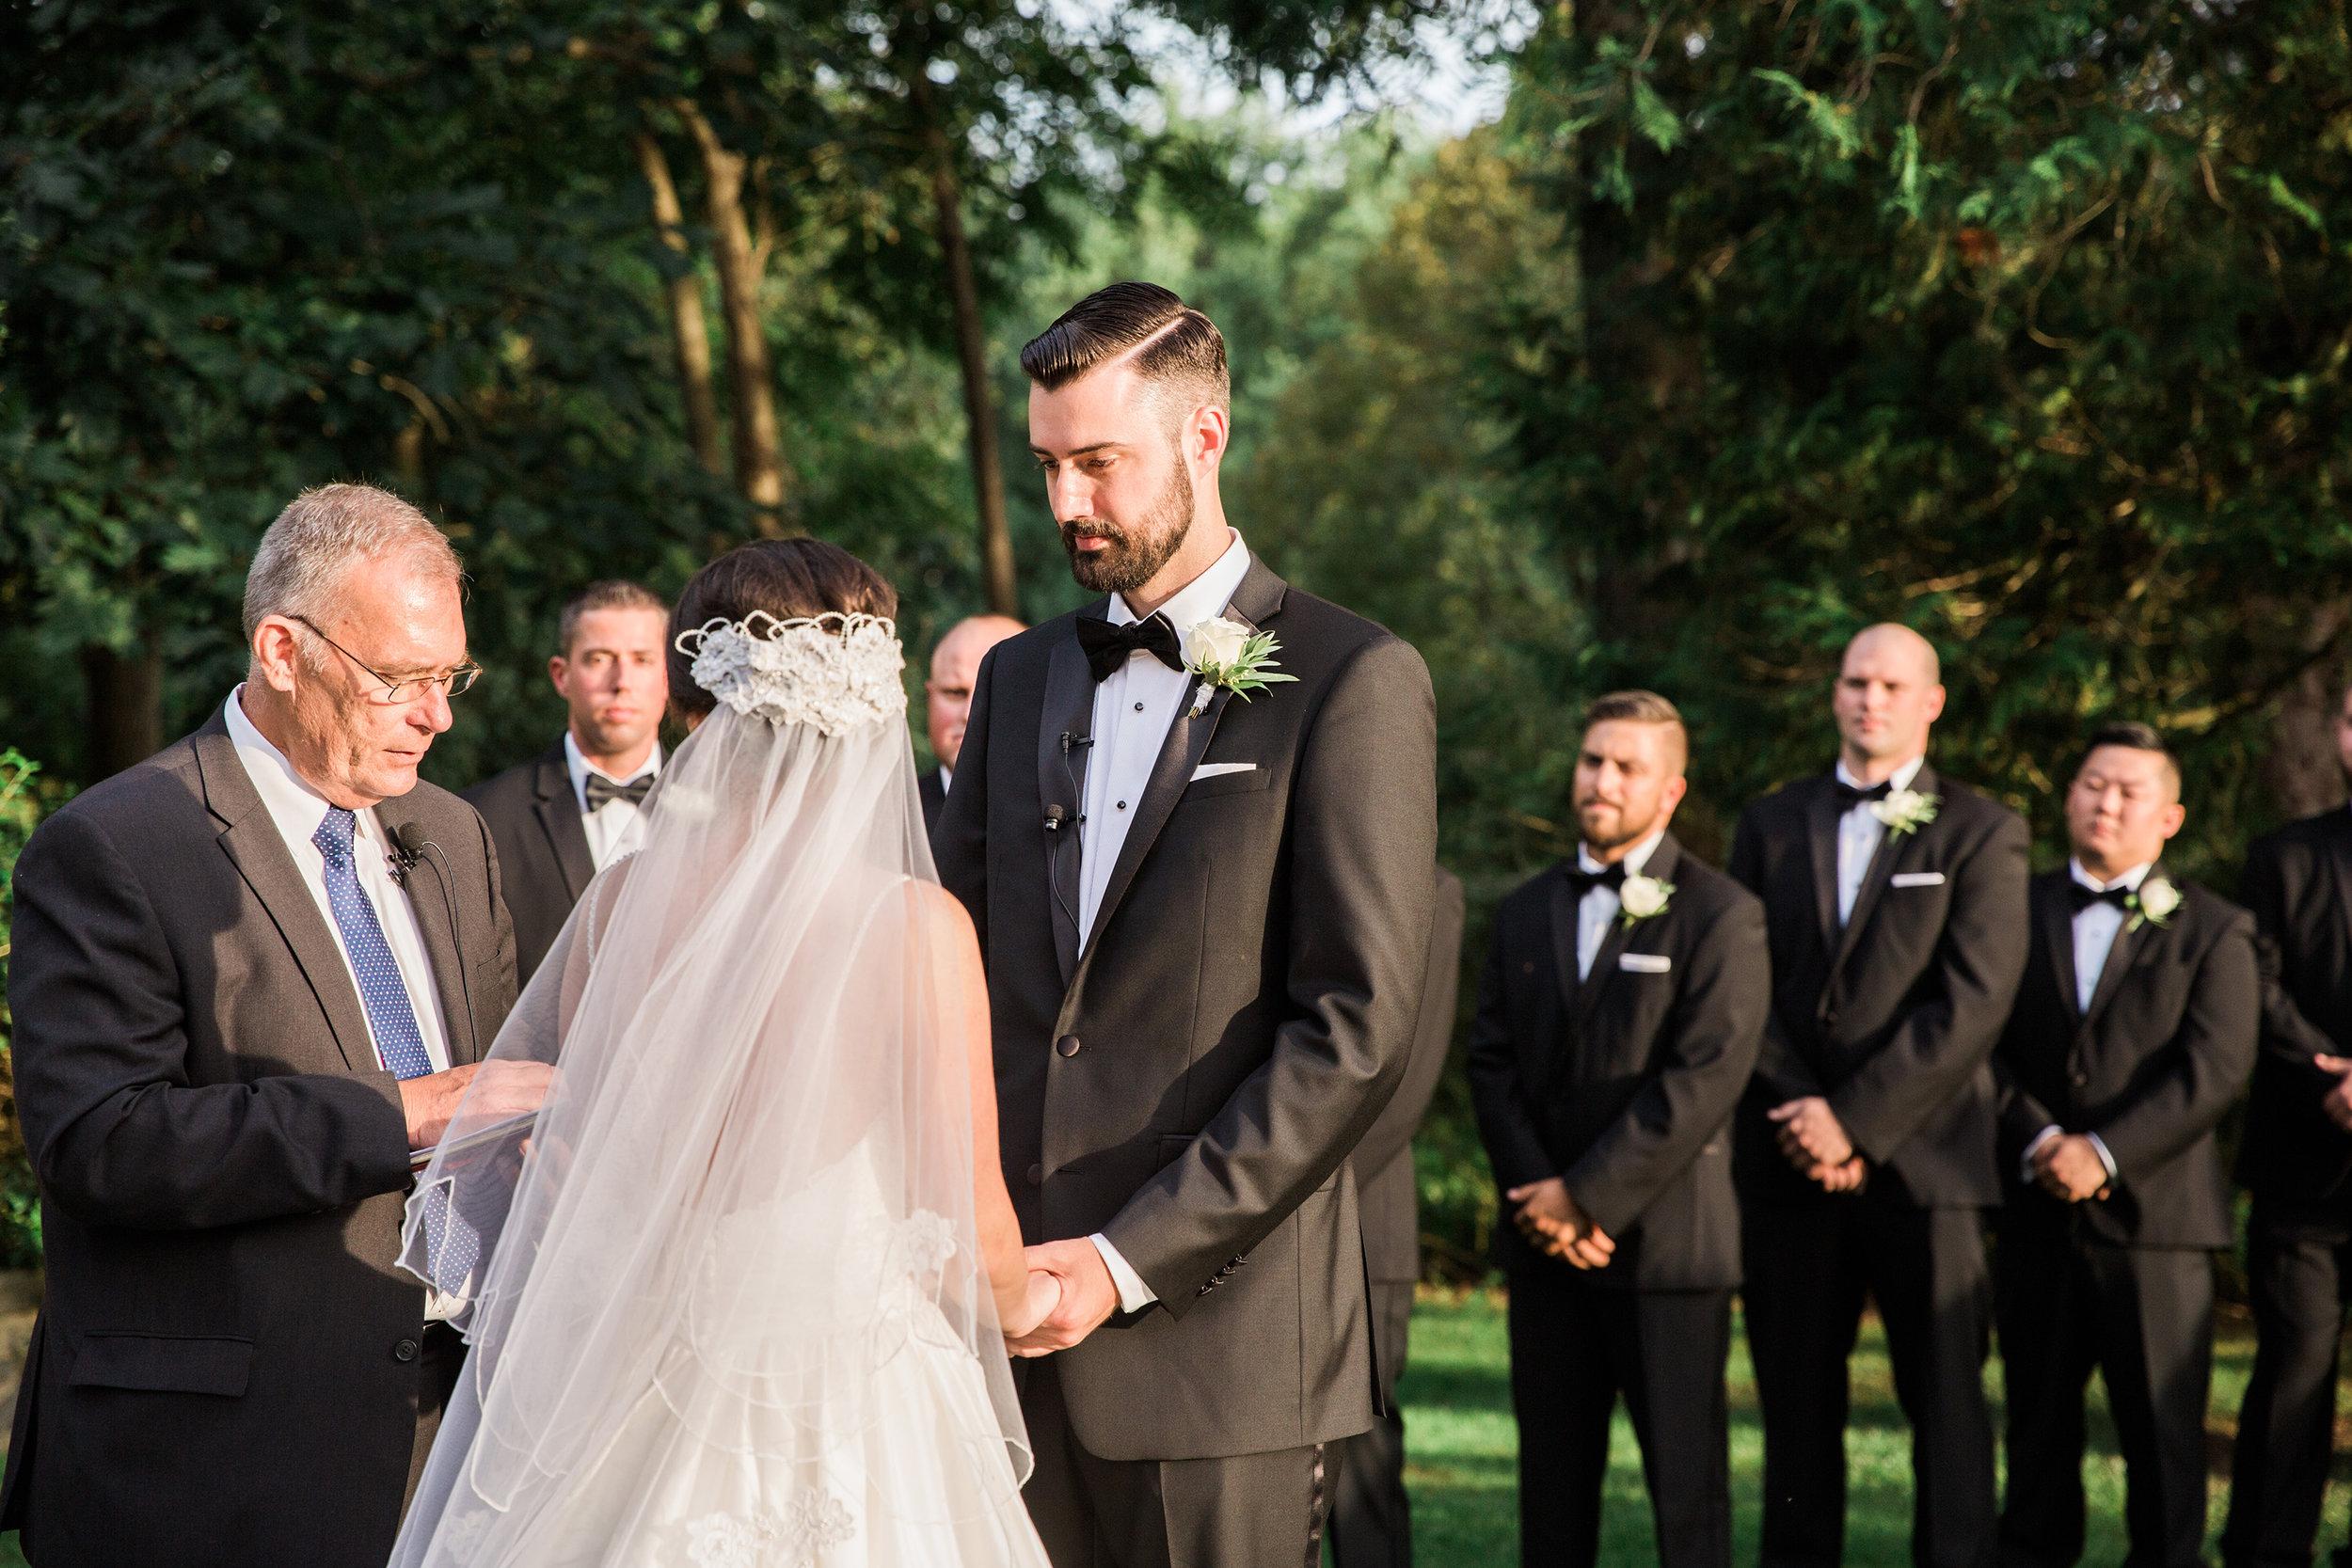 Evergreen-Museum-Balitmore-Maryland-Wedding-Black-Tie-Bride-029.jpg